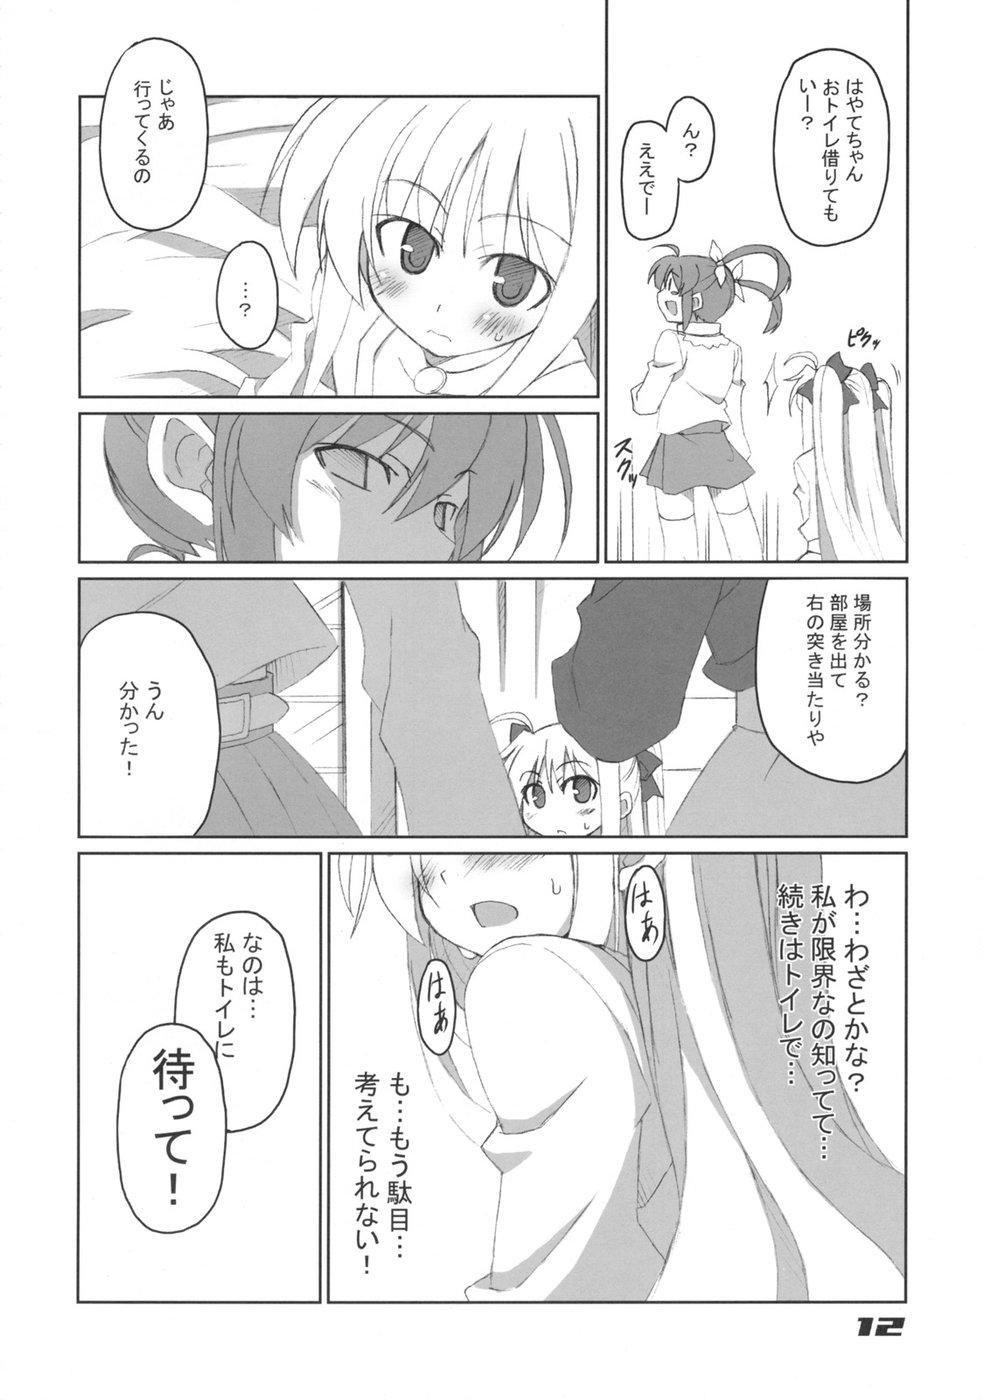 Fate-chan Igai to Moroi no A's 11